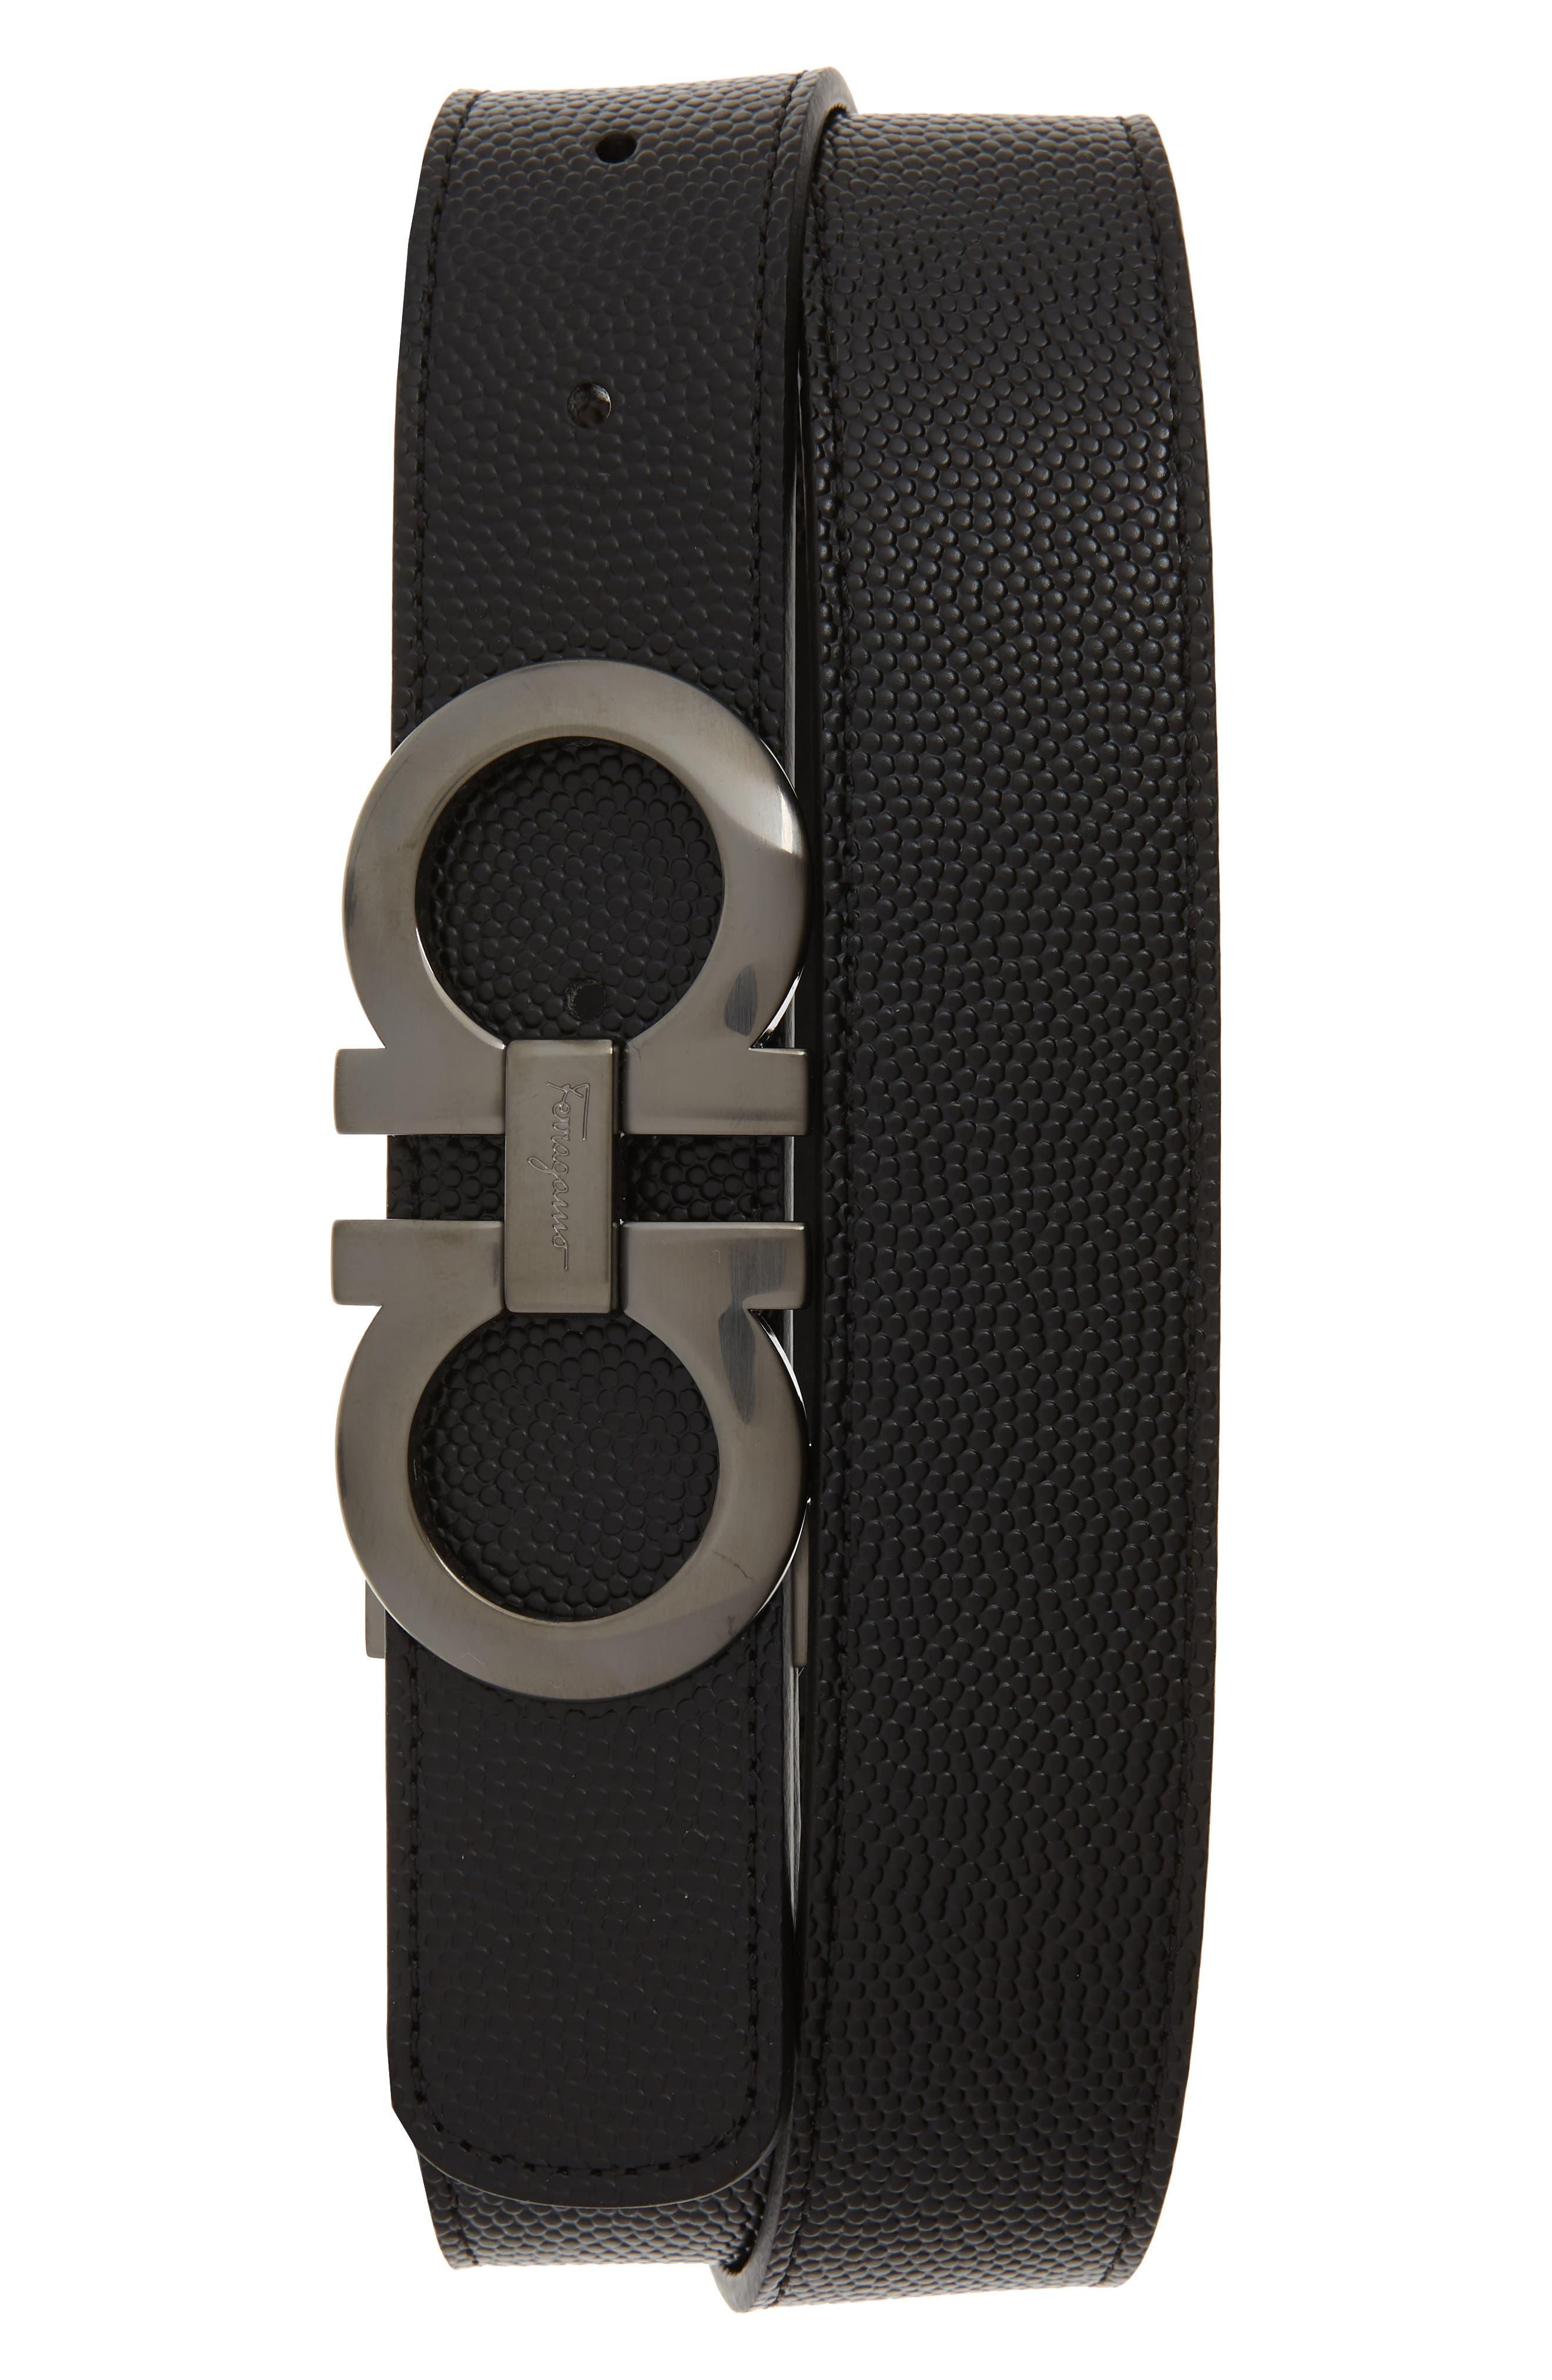 SALVATORE FERRAGAMO, Leather Belt, Main thumbnail 1, color, NERO/ CHOCOLATE